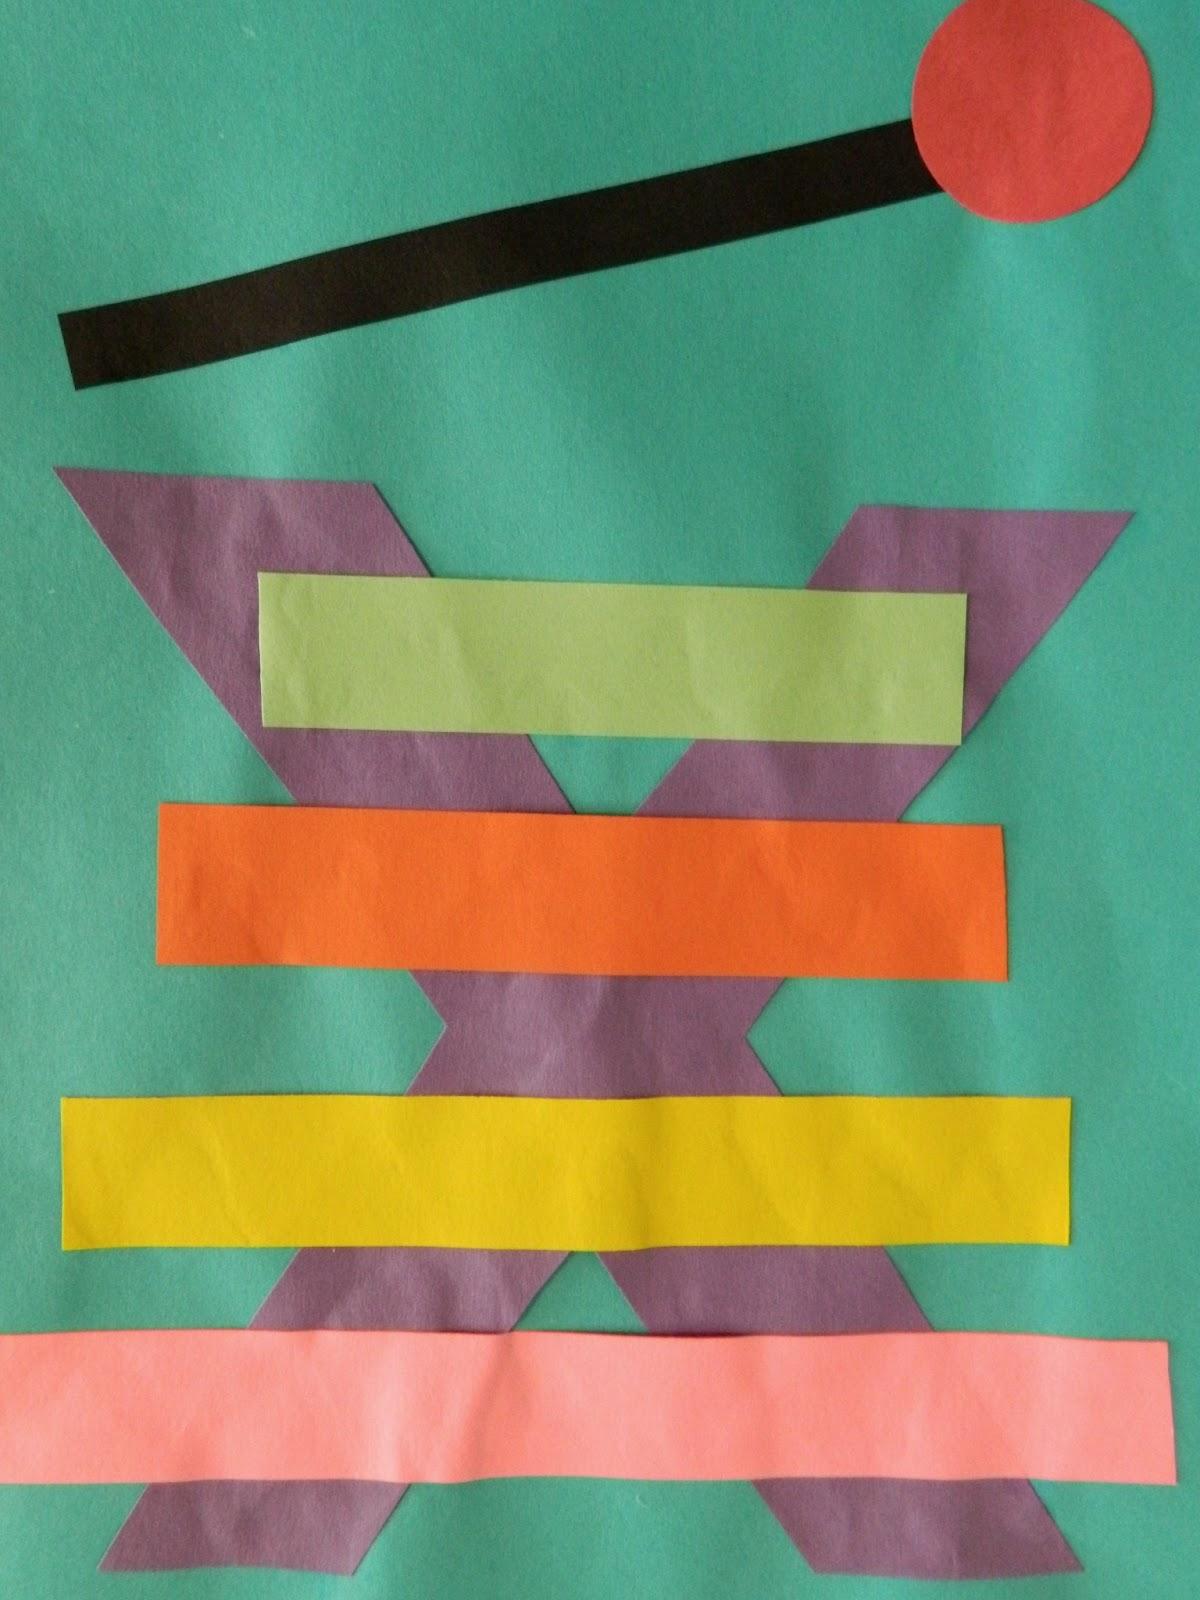 The Vintage Umbrella Preschool Alphabet Projects Q Z